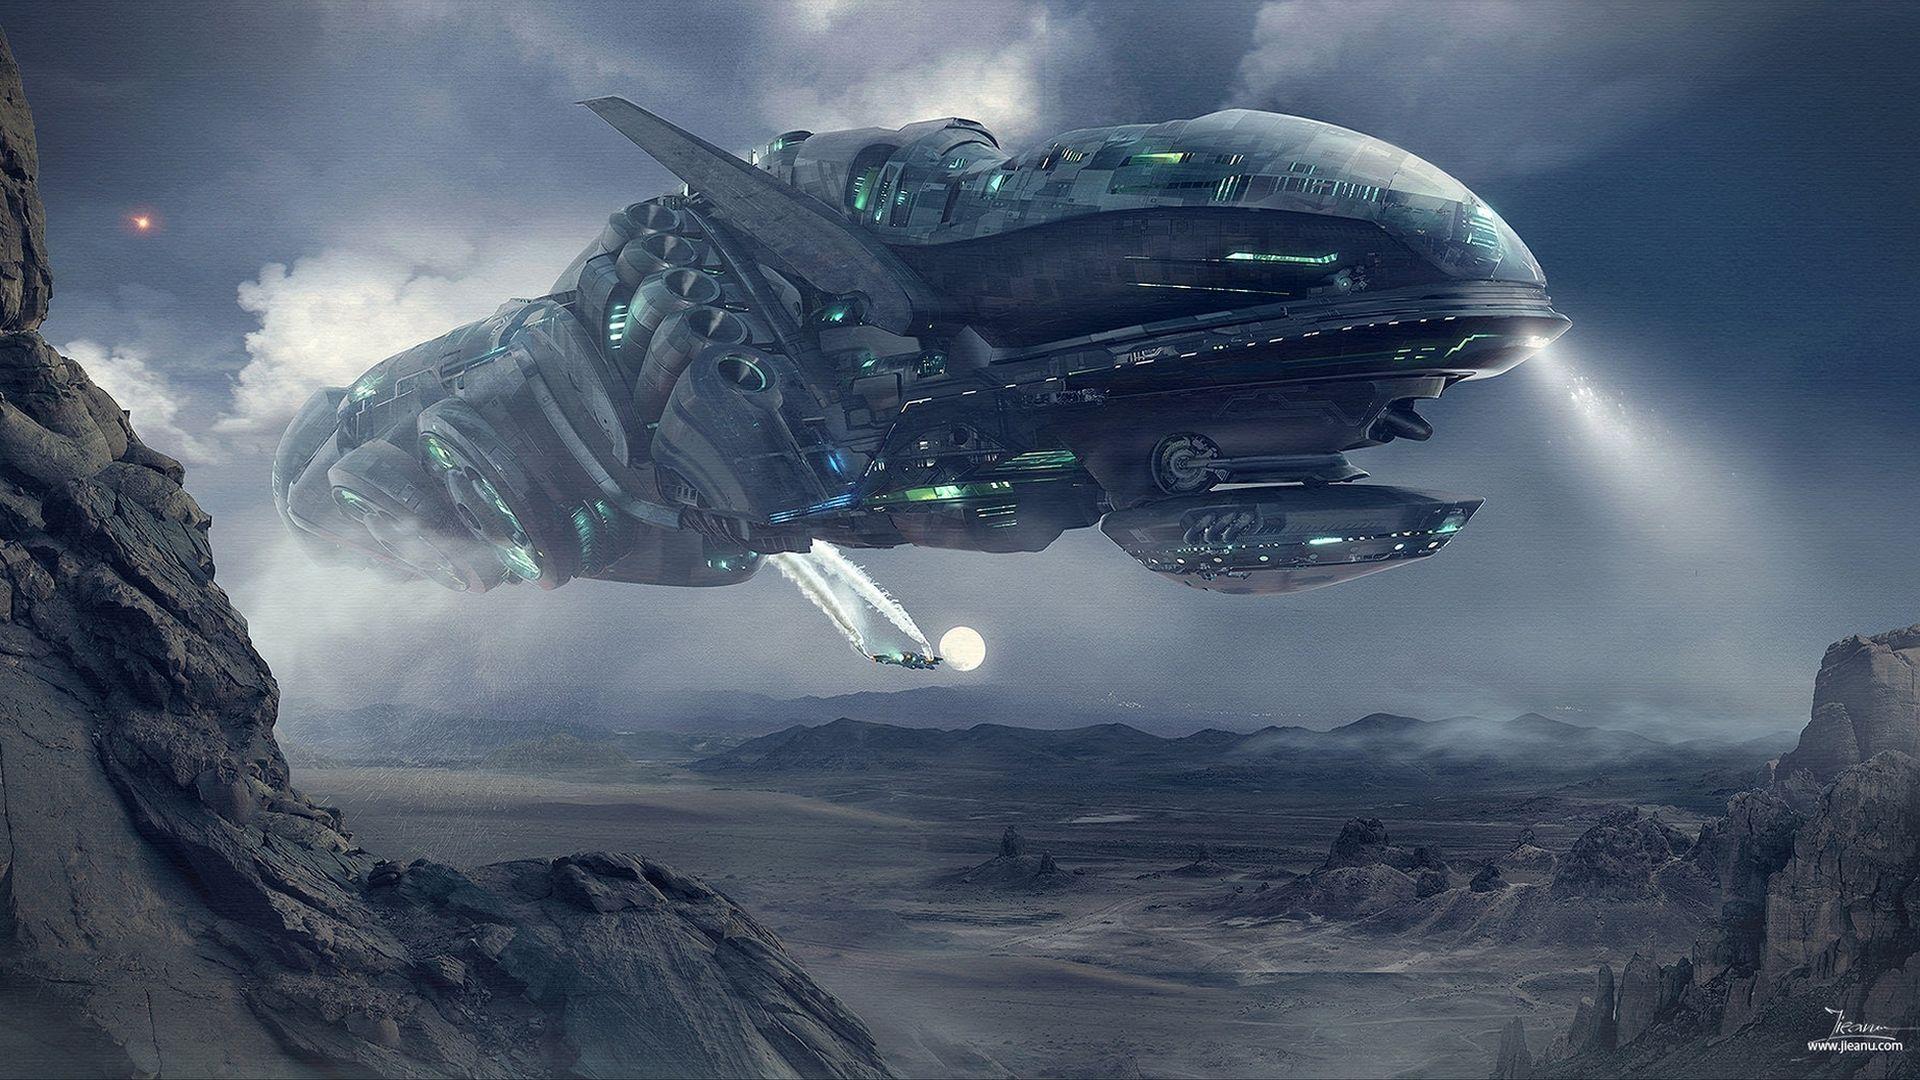 Sci Fi Spaceship Wallpaper Spaceship art, Alien